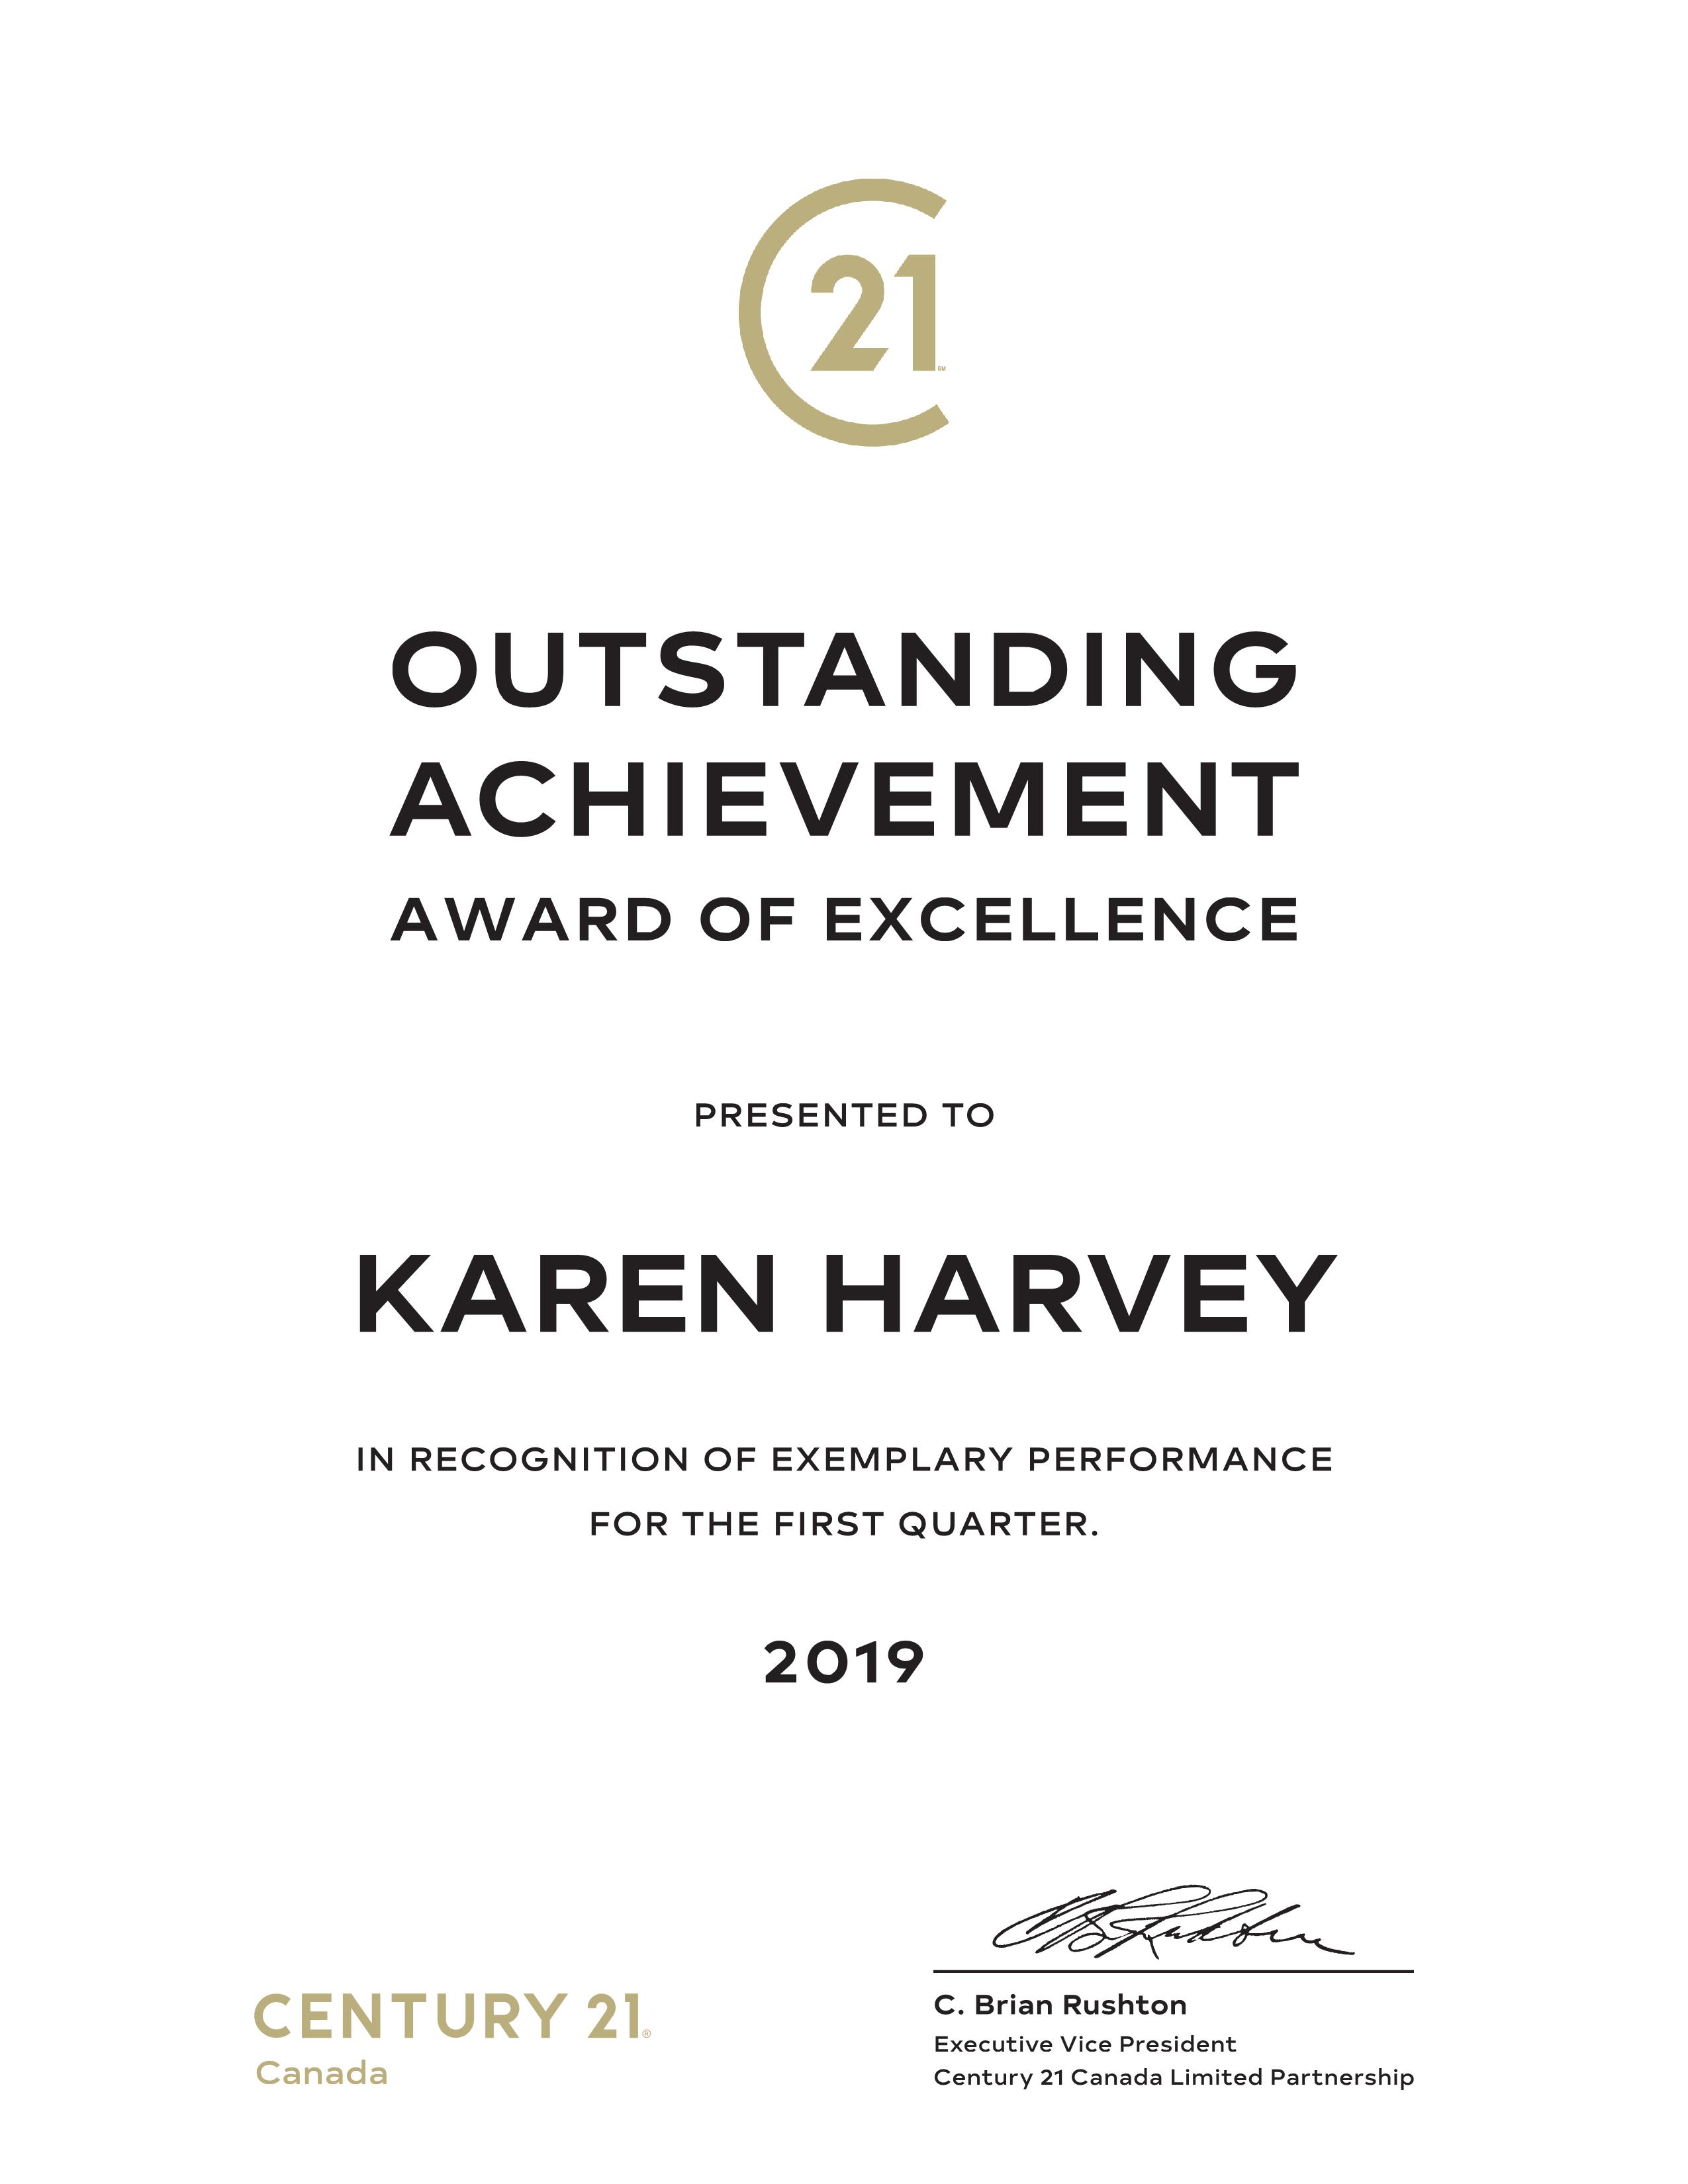 Century 21 Outstanding Achievement Award - Karen Harvey Real Estate